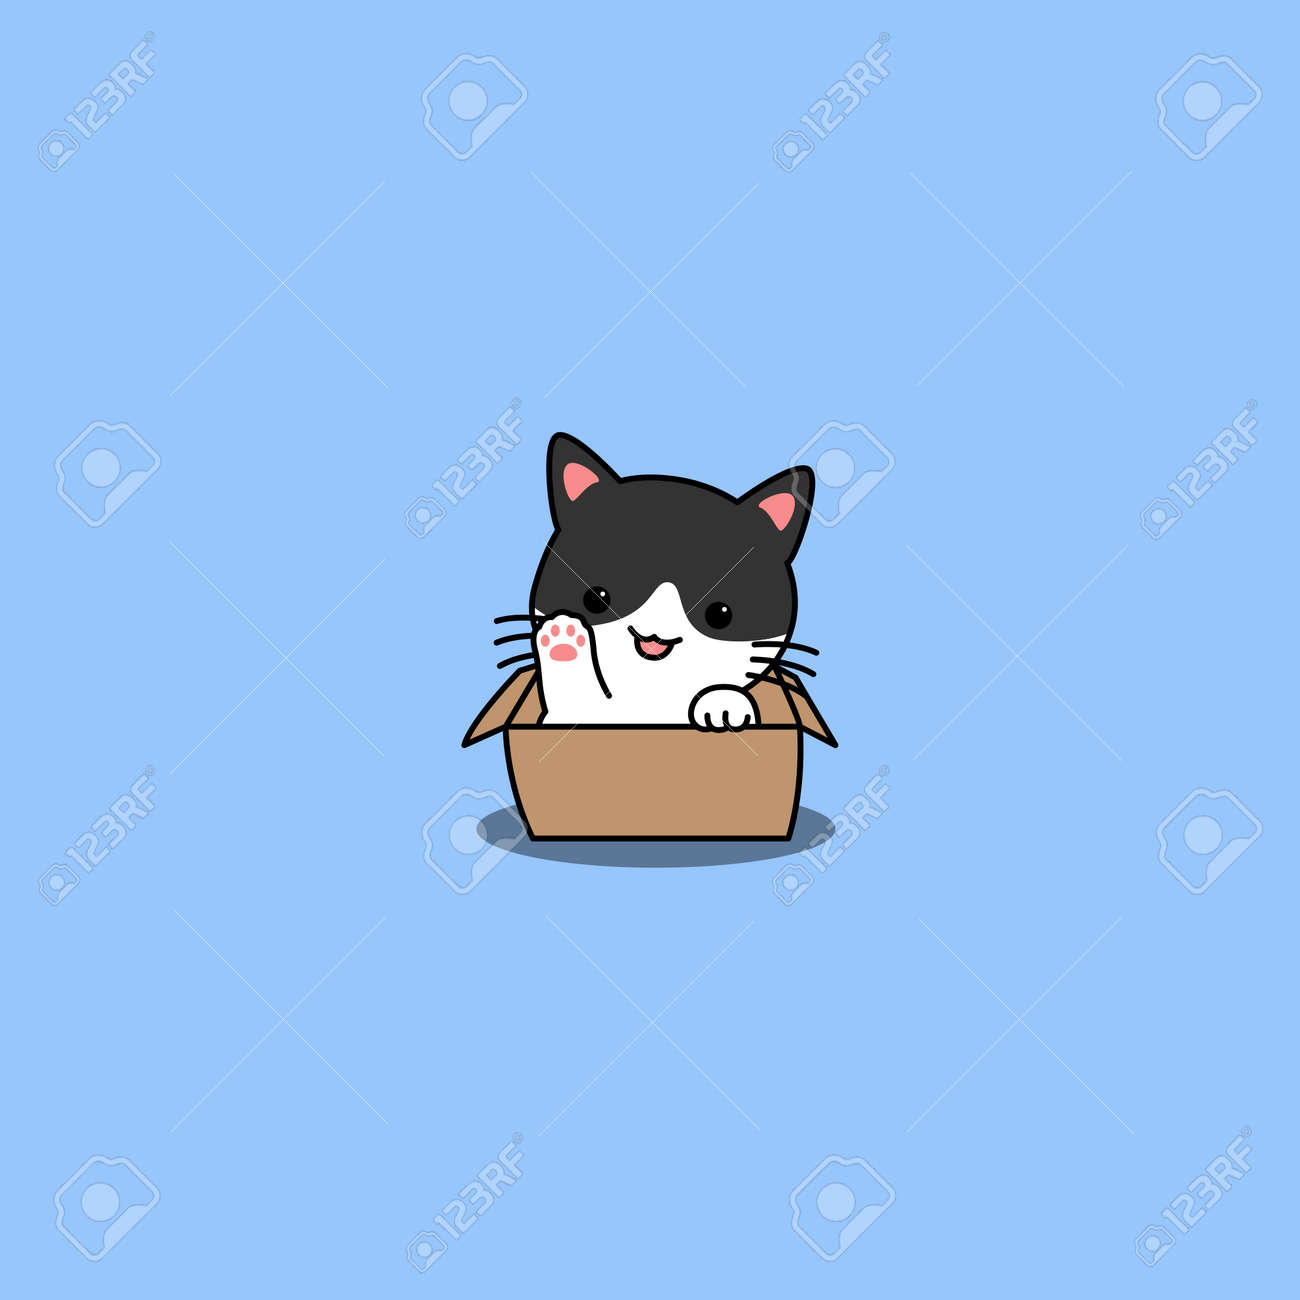 Cute cat waving paw in the box cartoon, vector illustration - 169153204